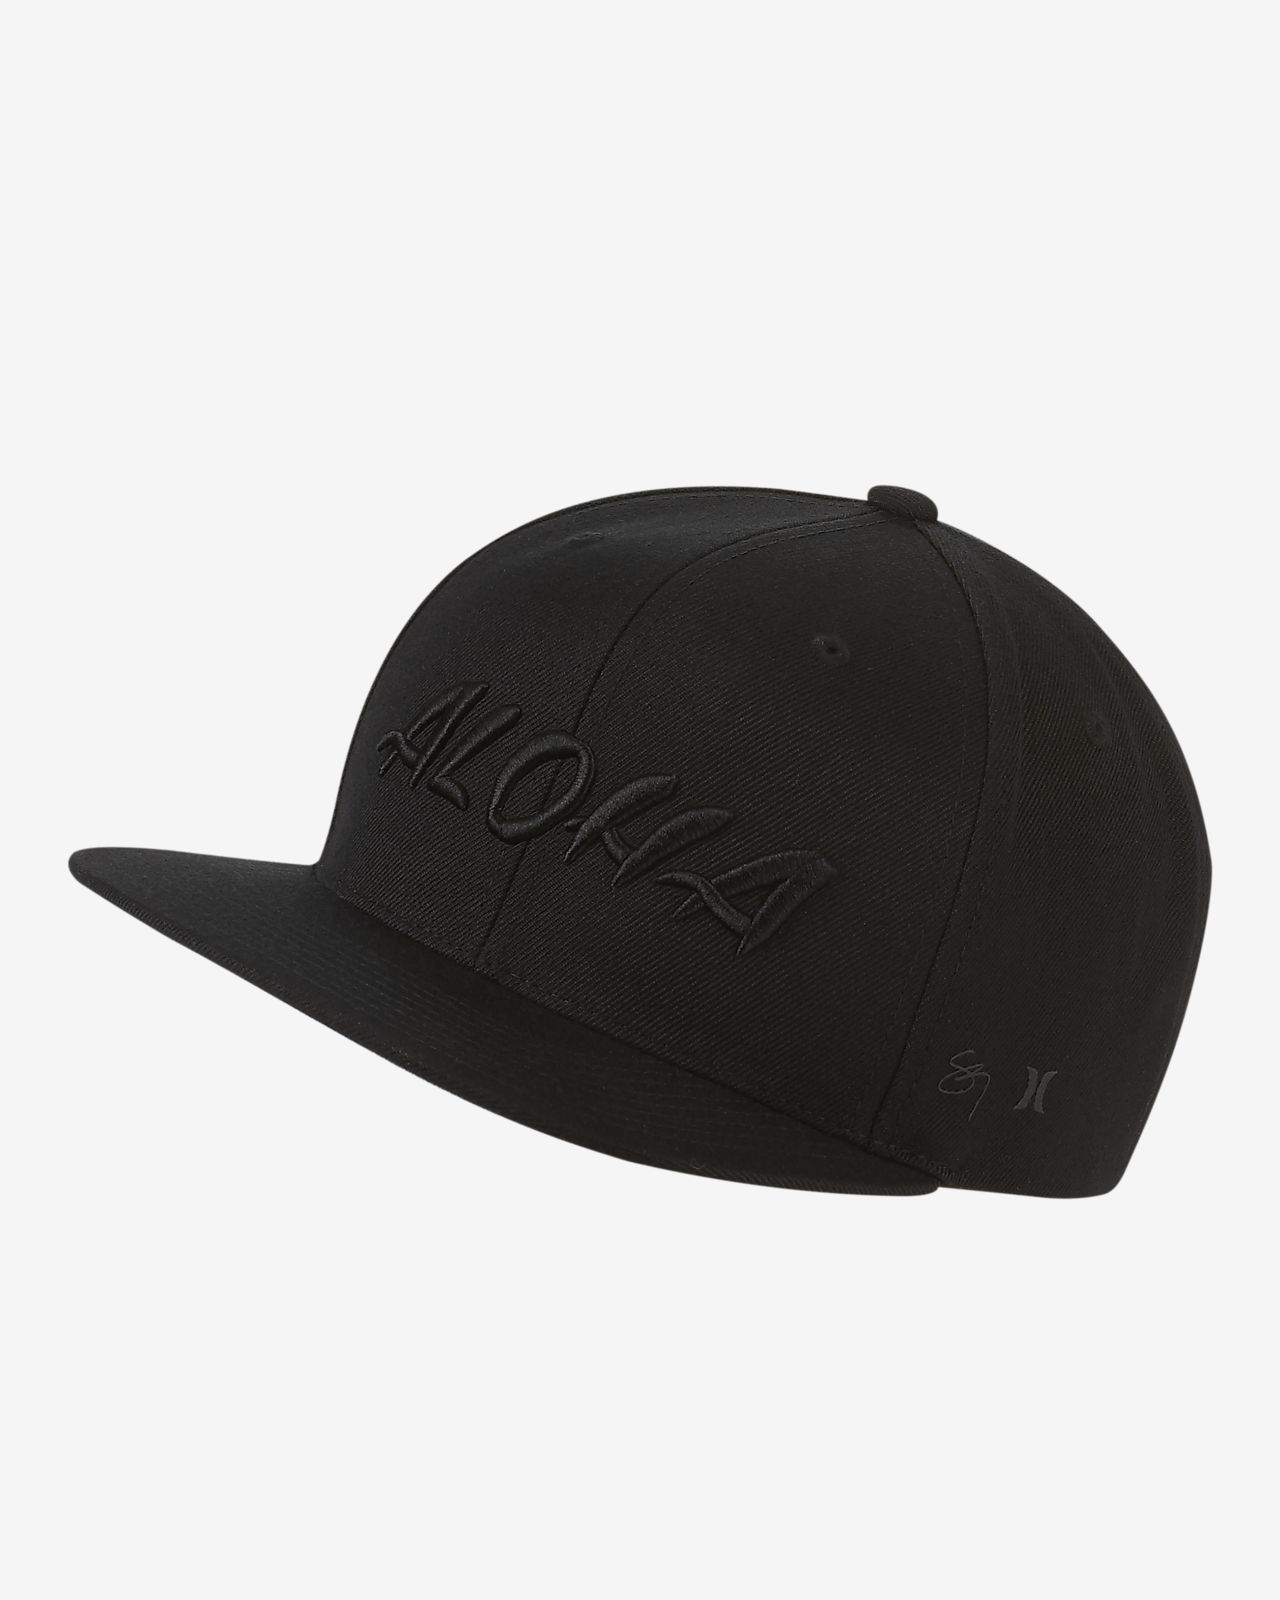 Hurley Sig Zane Maloulu Men s Hat. Nike.com a39f638df295